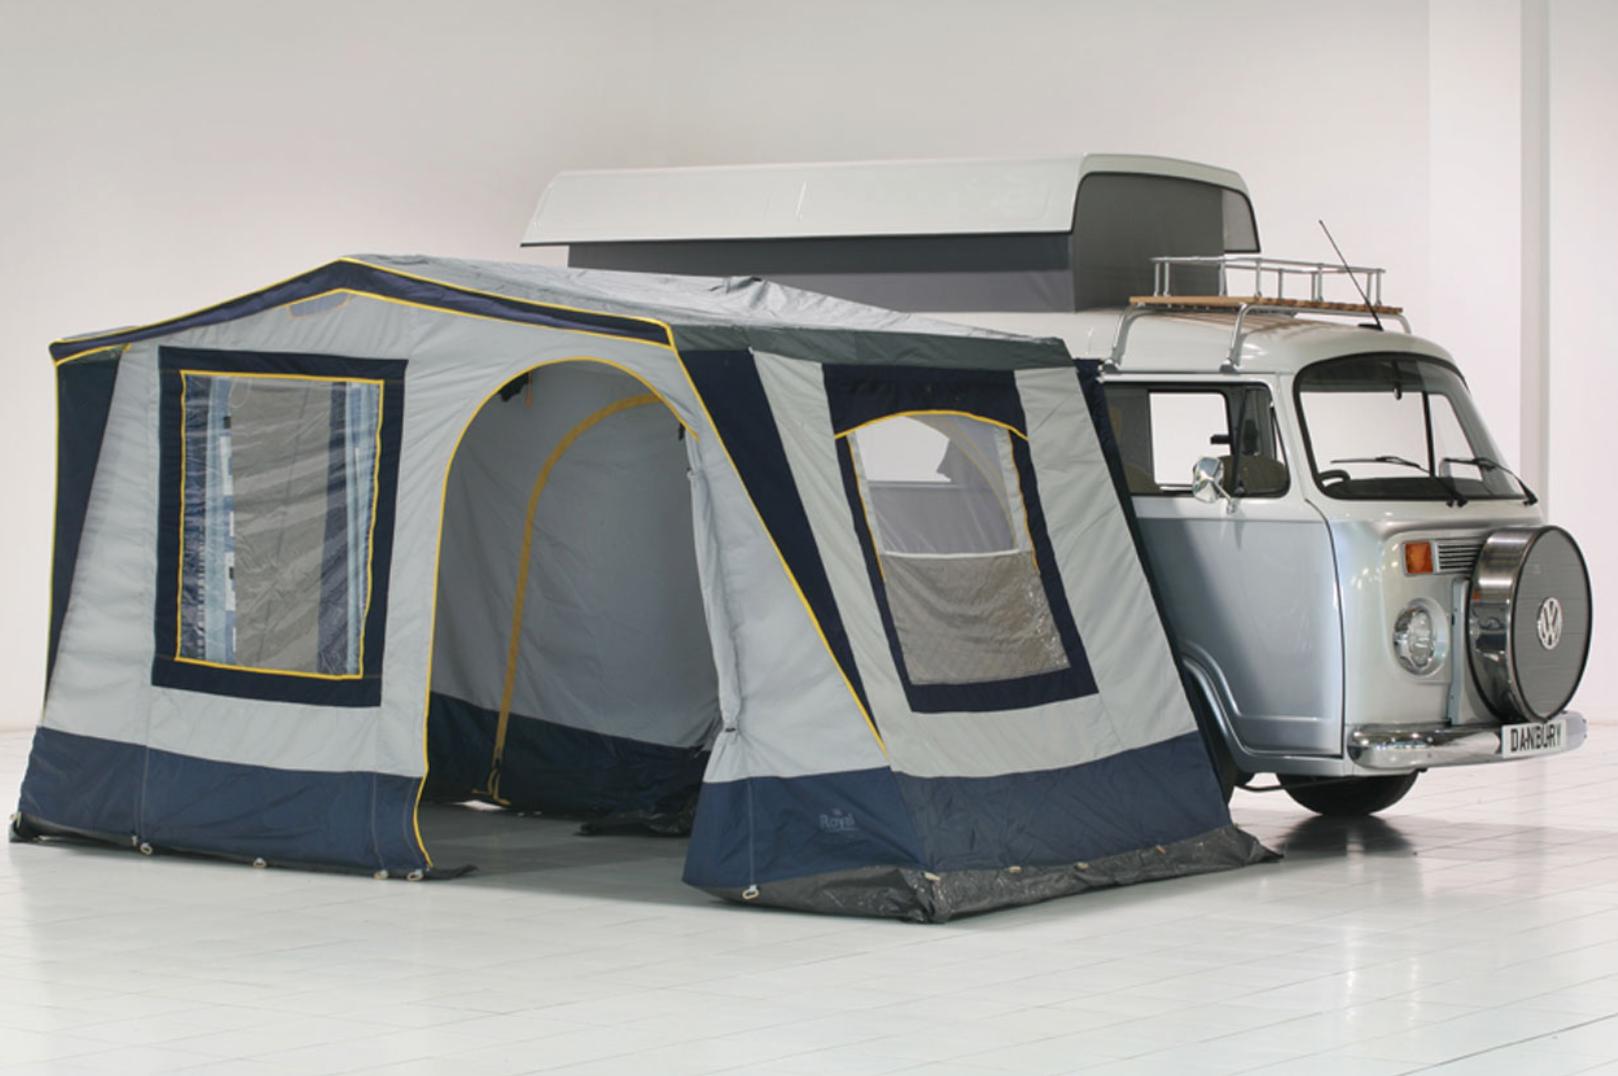 Volkswagen Bus Camper - Awning